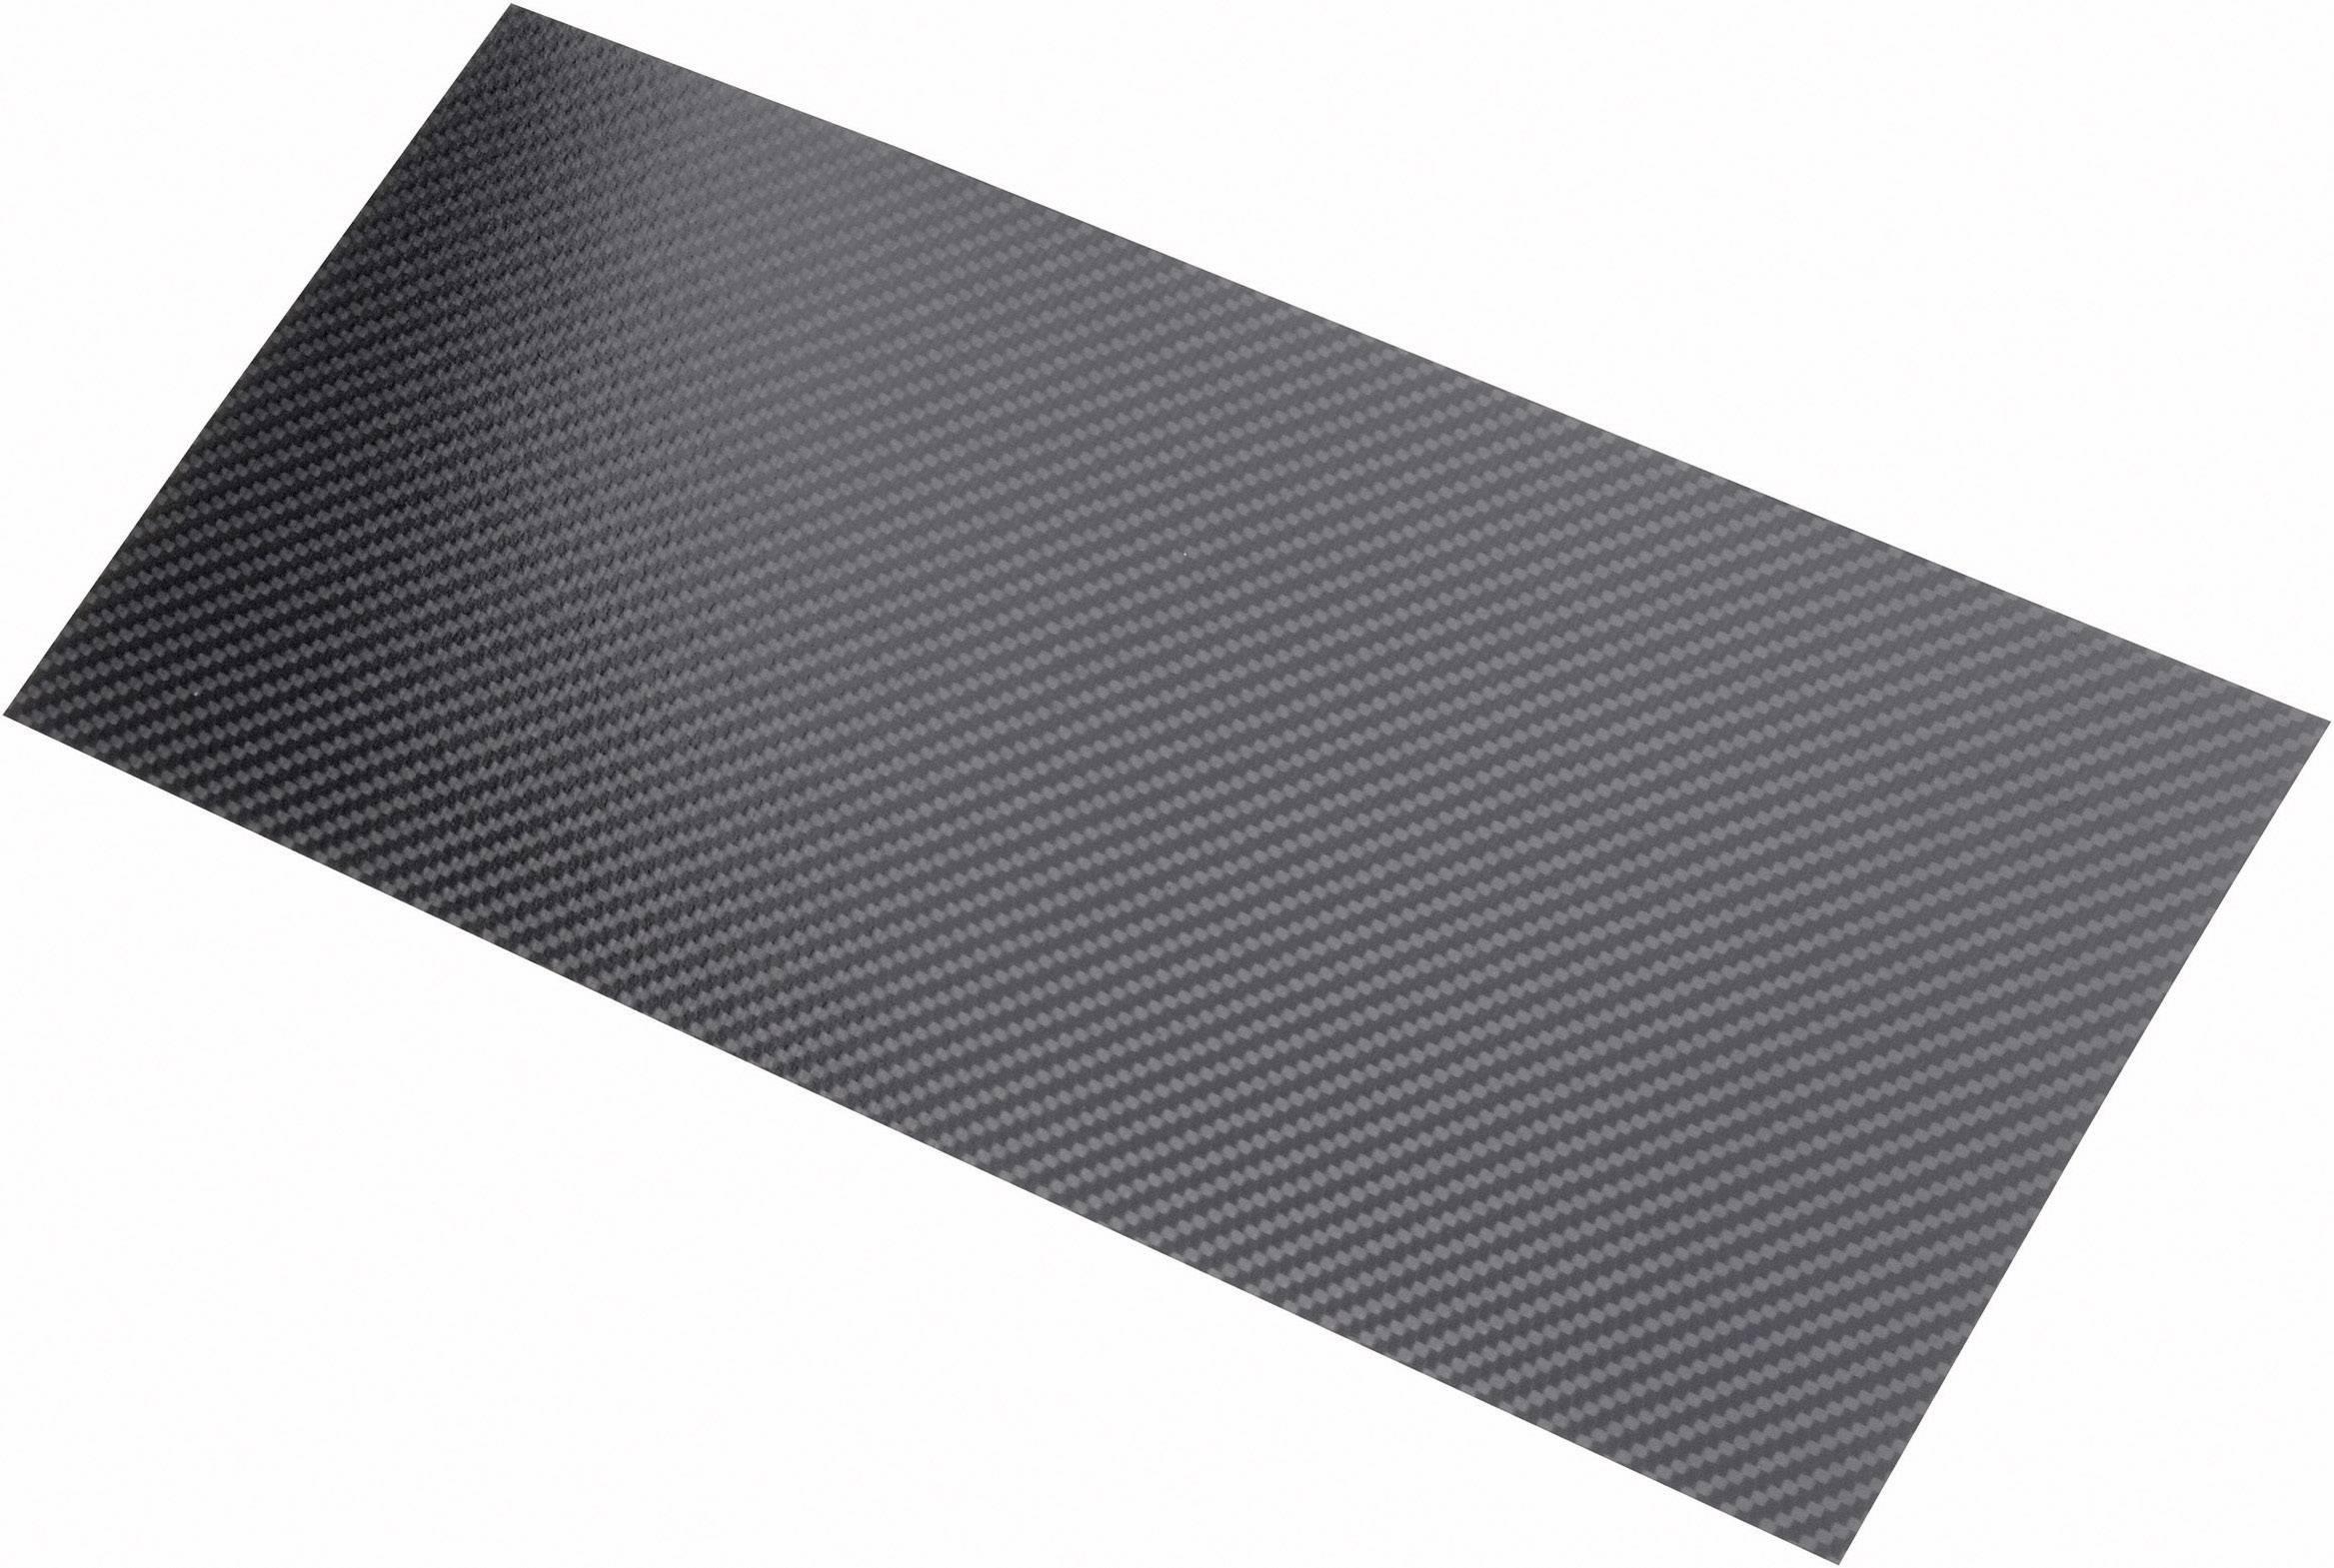 Doska z karbónových vlákien Carbotec 231663, (d x š) 340 mm x 150 mm x 0.30 mm